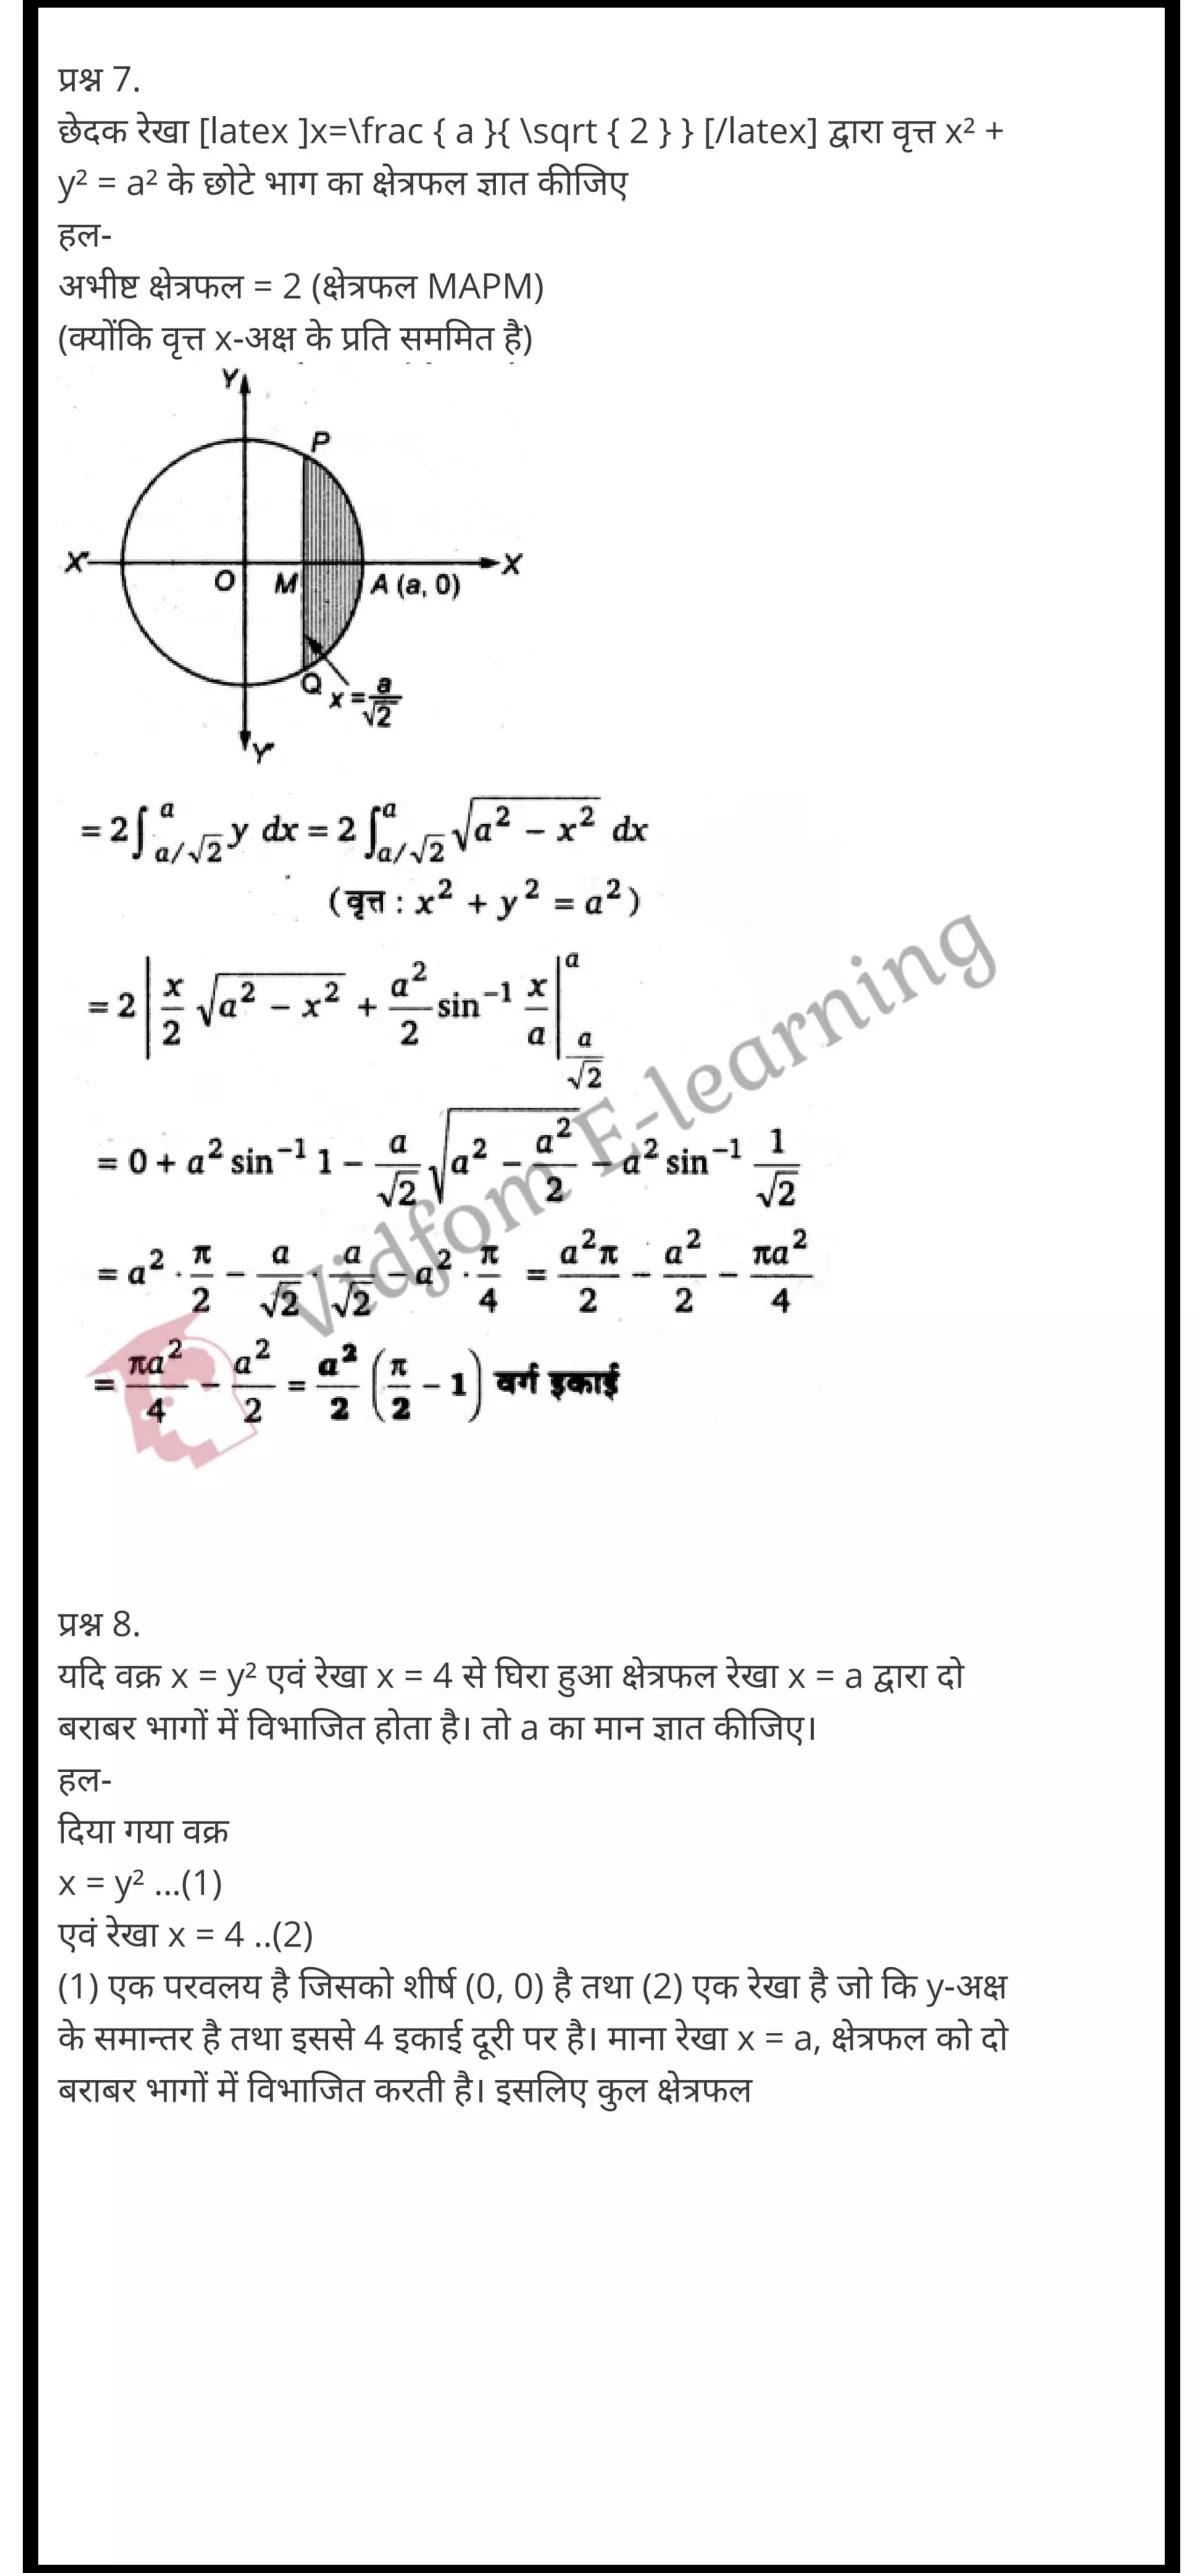 कक्षा 12 गणित  के नोट्स  हिंदी में एनसीईआरटी समाधान,     class 12 Maths Chapter 8,   class 12 Maths Chapter 8 ncert solutions in Hindi,   class 12 Maths Chapter 8 notes in hindi,   class 12 Maths Chapter 8 question answer,   class 12 Maths Chapter 8 notes,   class 12 Maths Chapter 8 class 12 Maths Chapter 8 in  hindi,    class 12 Maths Chapter 8 important questions in  hindi,   class 12 Maths Chapter 8 notes in hindi,    class 12 Maths Chapter 8 test,   class 12 Maths Chapter 8 pdf,   class 12 Maths Chapter 8 notes pdf,   class 12 Maths Chapter 8 exercise solutions,   class 12 Maths Chapter 8 notes study rankers,   class 12 Maths Chapter 8 notes,    class 12 Maths Chapter 8  class 12  notes pdf,   class 12 Maths Chapter 8 class 12  notes  ncert,   class 12 Maths Chapter 8 class 12 pdf,   class 12 Maths Chapter 8  book,   class 12 Maths Chapter 8 quiz class 12  ,    10  th class 12 Maths Chapter 8  book up board,   up board 10  th class 12 Maths Chapter 8 notes,  class 12 Maths,   class 12 Maths ncert solutions in Hindi,   class 12 Maths notes in hindi,   class 12 Maths question answer,   class 12 Maths notes,  class 12 Maths class 12 Maths Chapter 8 in  hindi,    class 12 Maths important questions in  hindi,   class 12 Maths notes in hindi,    class 12 Maths test,  class 12 Maths class 12 Maths Chapter 8 pdf,   class 12 Maths notes pdf,   class 12 Maths exercise solutions,   class 12 Maths,  class 12 Maths notes study rankers,   class 12 Maths notes,  class 12 Maths notes,   class 12 Maths  class 12  notes pdf,   class 12 Maths class 12  notes  ncert,   class 12 Maths class 12 pdf,   class 12 Maths  book,  class 12 Maths quiz class 12  ,  10  th class 12 Maths    book up board,    up board 10  th class 12 Maths notes,      कक्षा 12 गणित अध्याय 8 ,  कक्षा 12 गणित, कक्षा 12 गणित अध्याय 8  के नोट्स हिंदी में,  कक्षा 12 का हिंदी अध्याय 8 का प्रश्न उत्तर,  कक्षा 12 गणित अध्याय 8 के नोट्स,  10 कक्षा गणित  हिंदी में, कक्षा 12 गणित अध्याय 8  हिंदी में,  कक्षा 12 गणित अध्याय